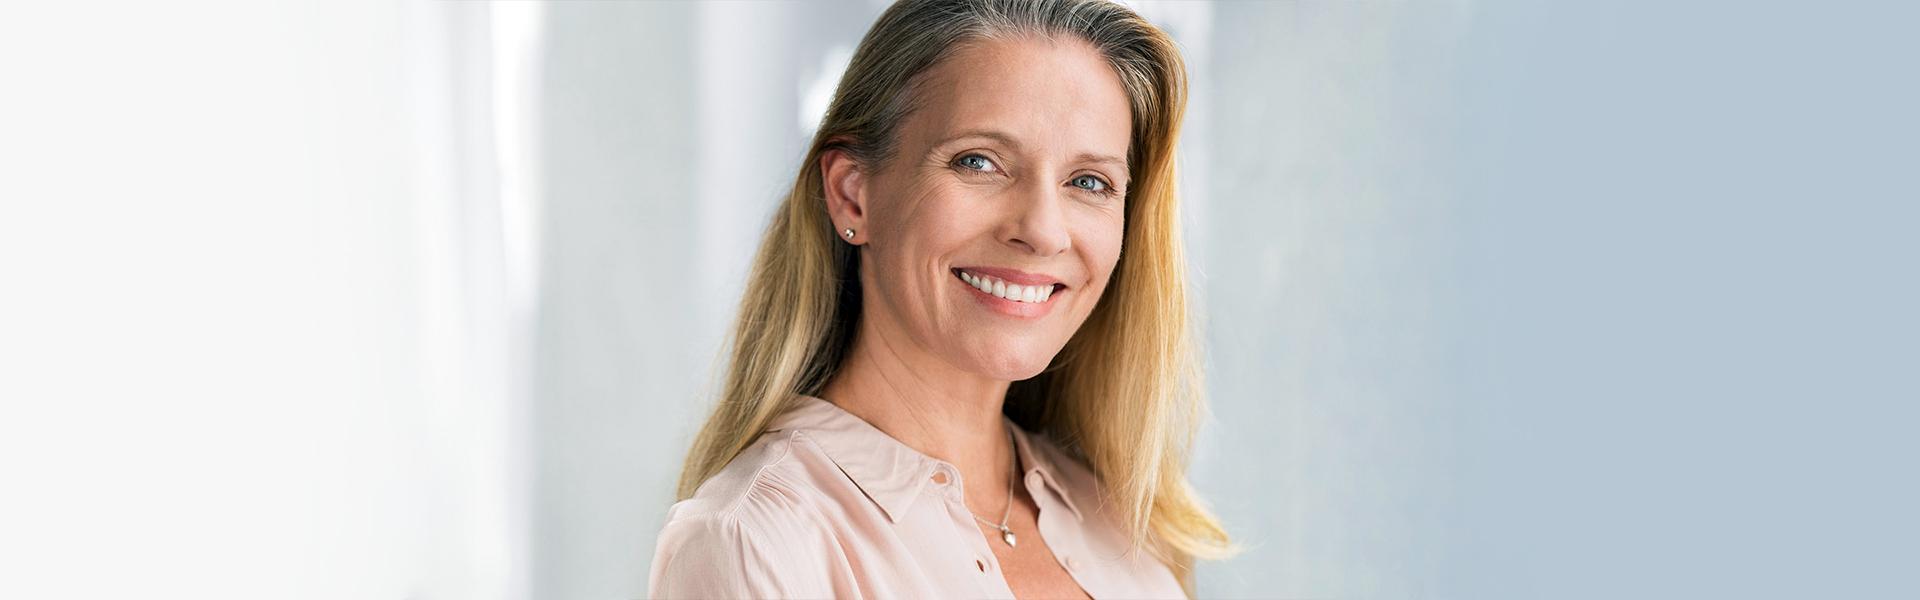 Are Dental Implants Successful in Replacing Missing Teeth?